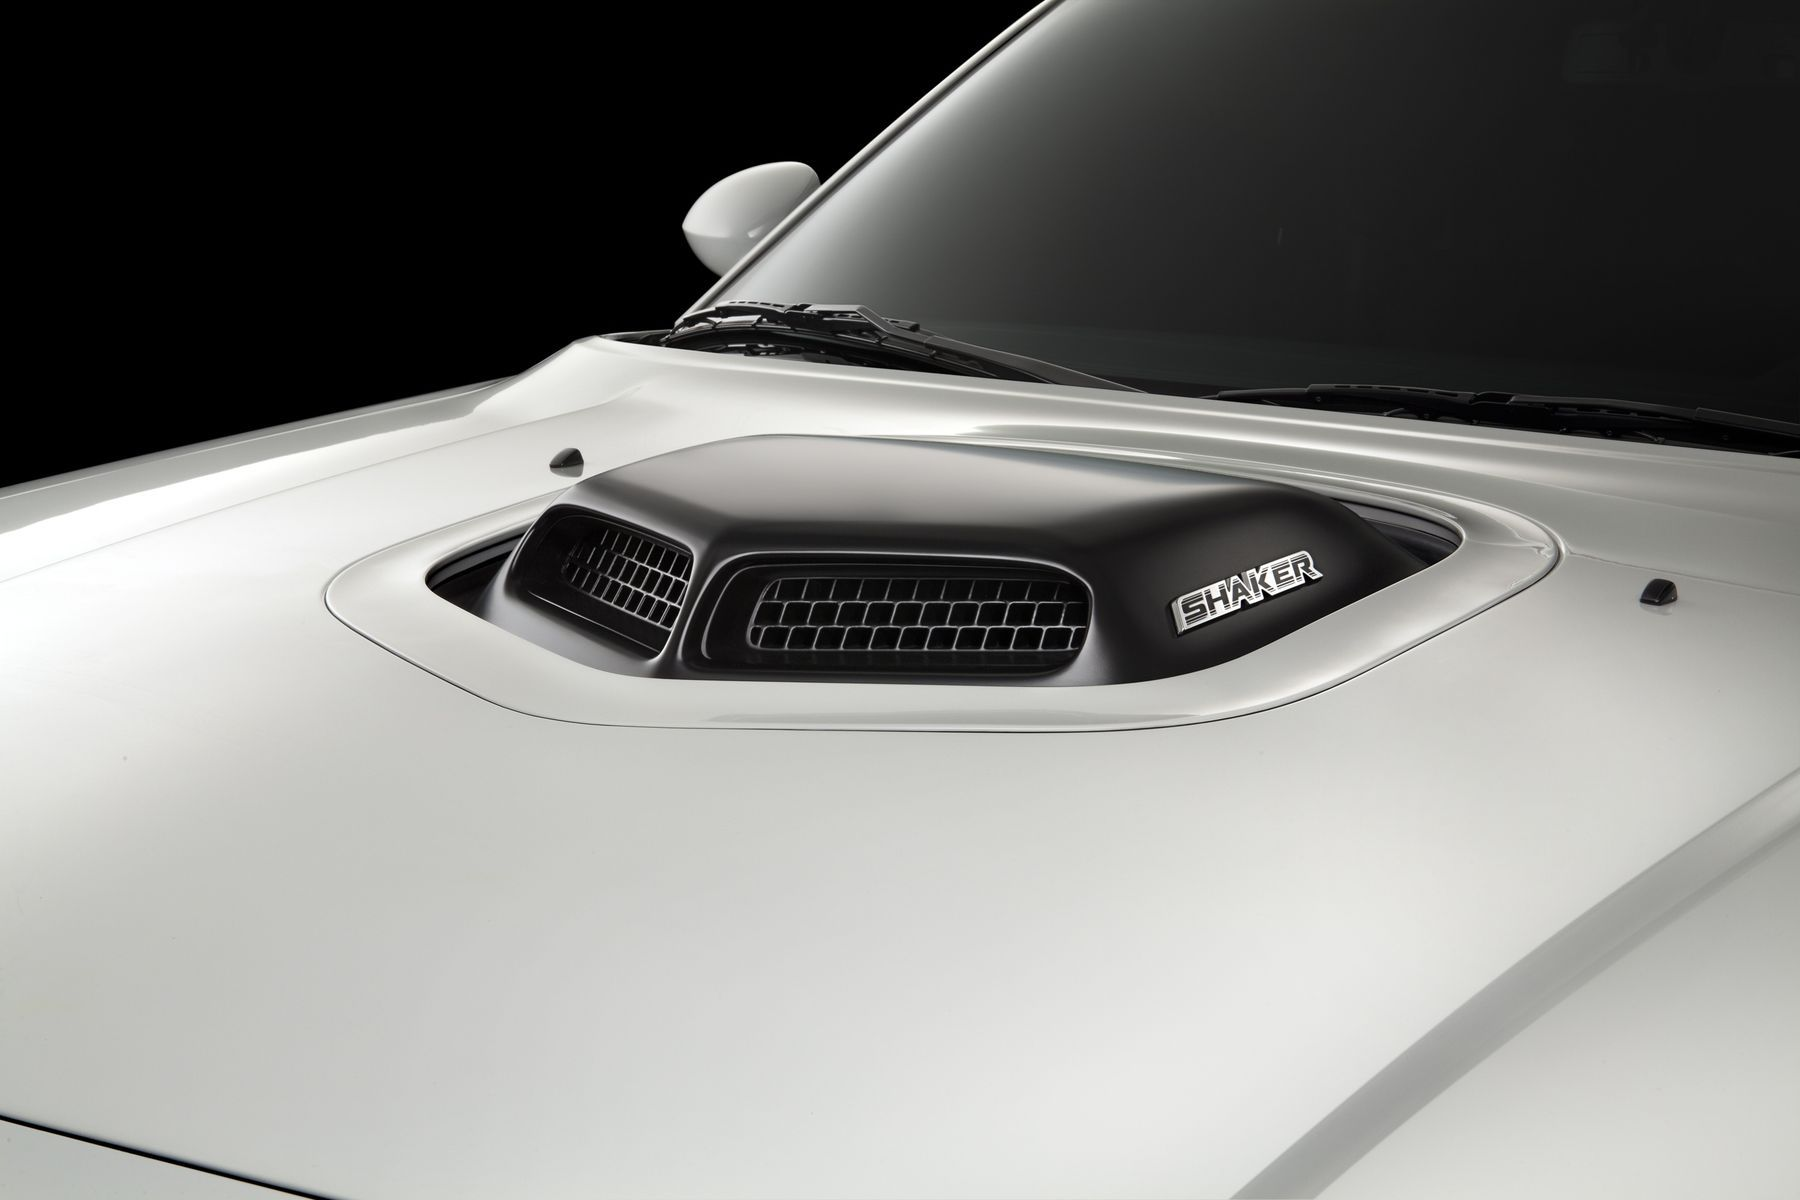 2014 Dodge Challenger | Mopar Edition 2014 Dodge Challenger